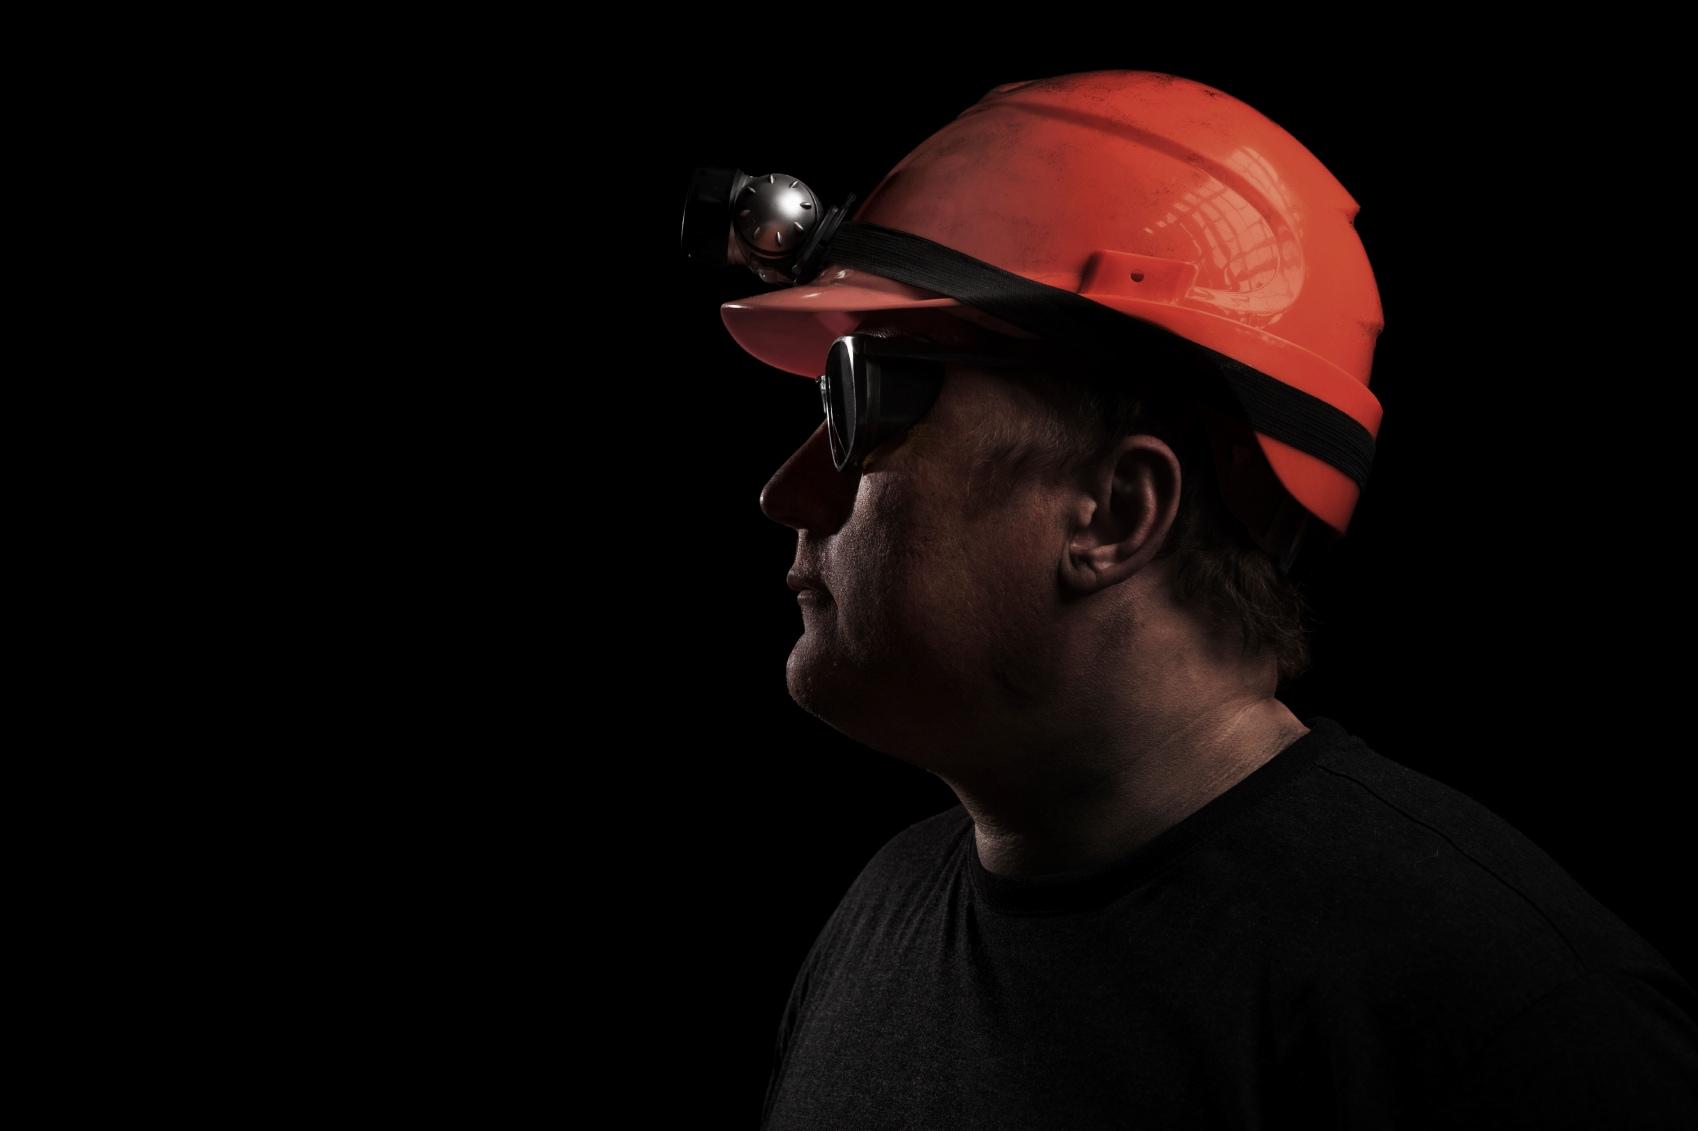 coal mine worker